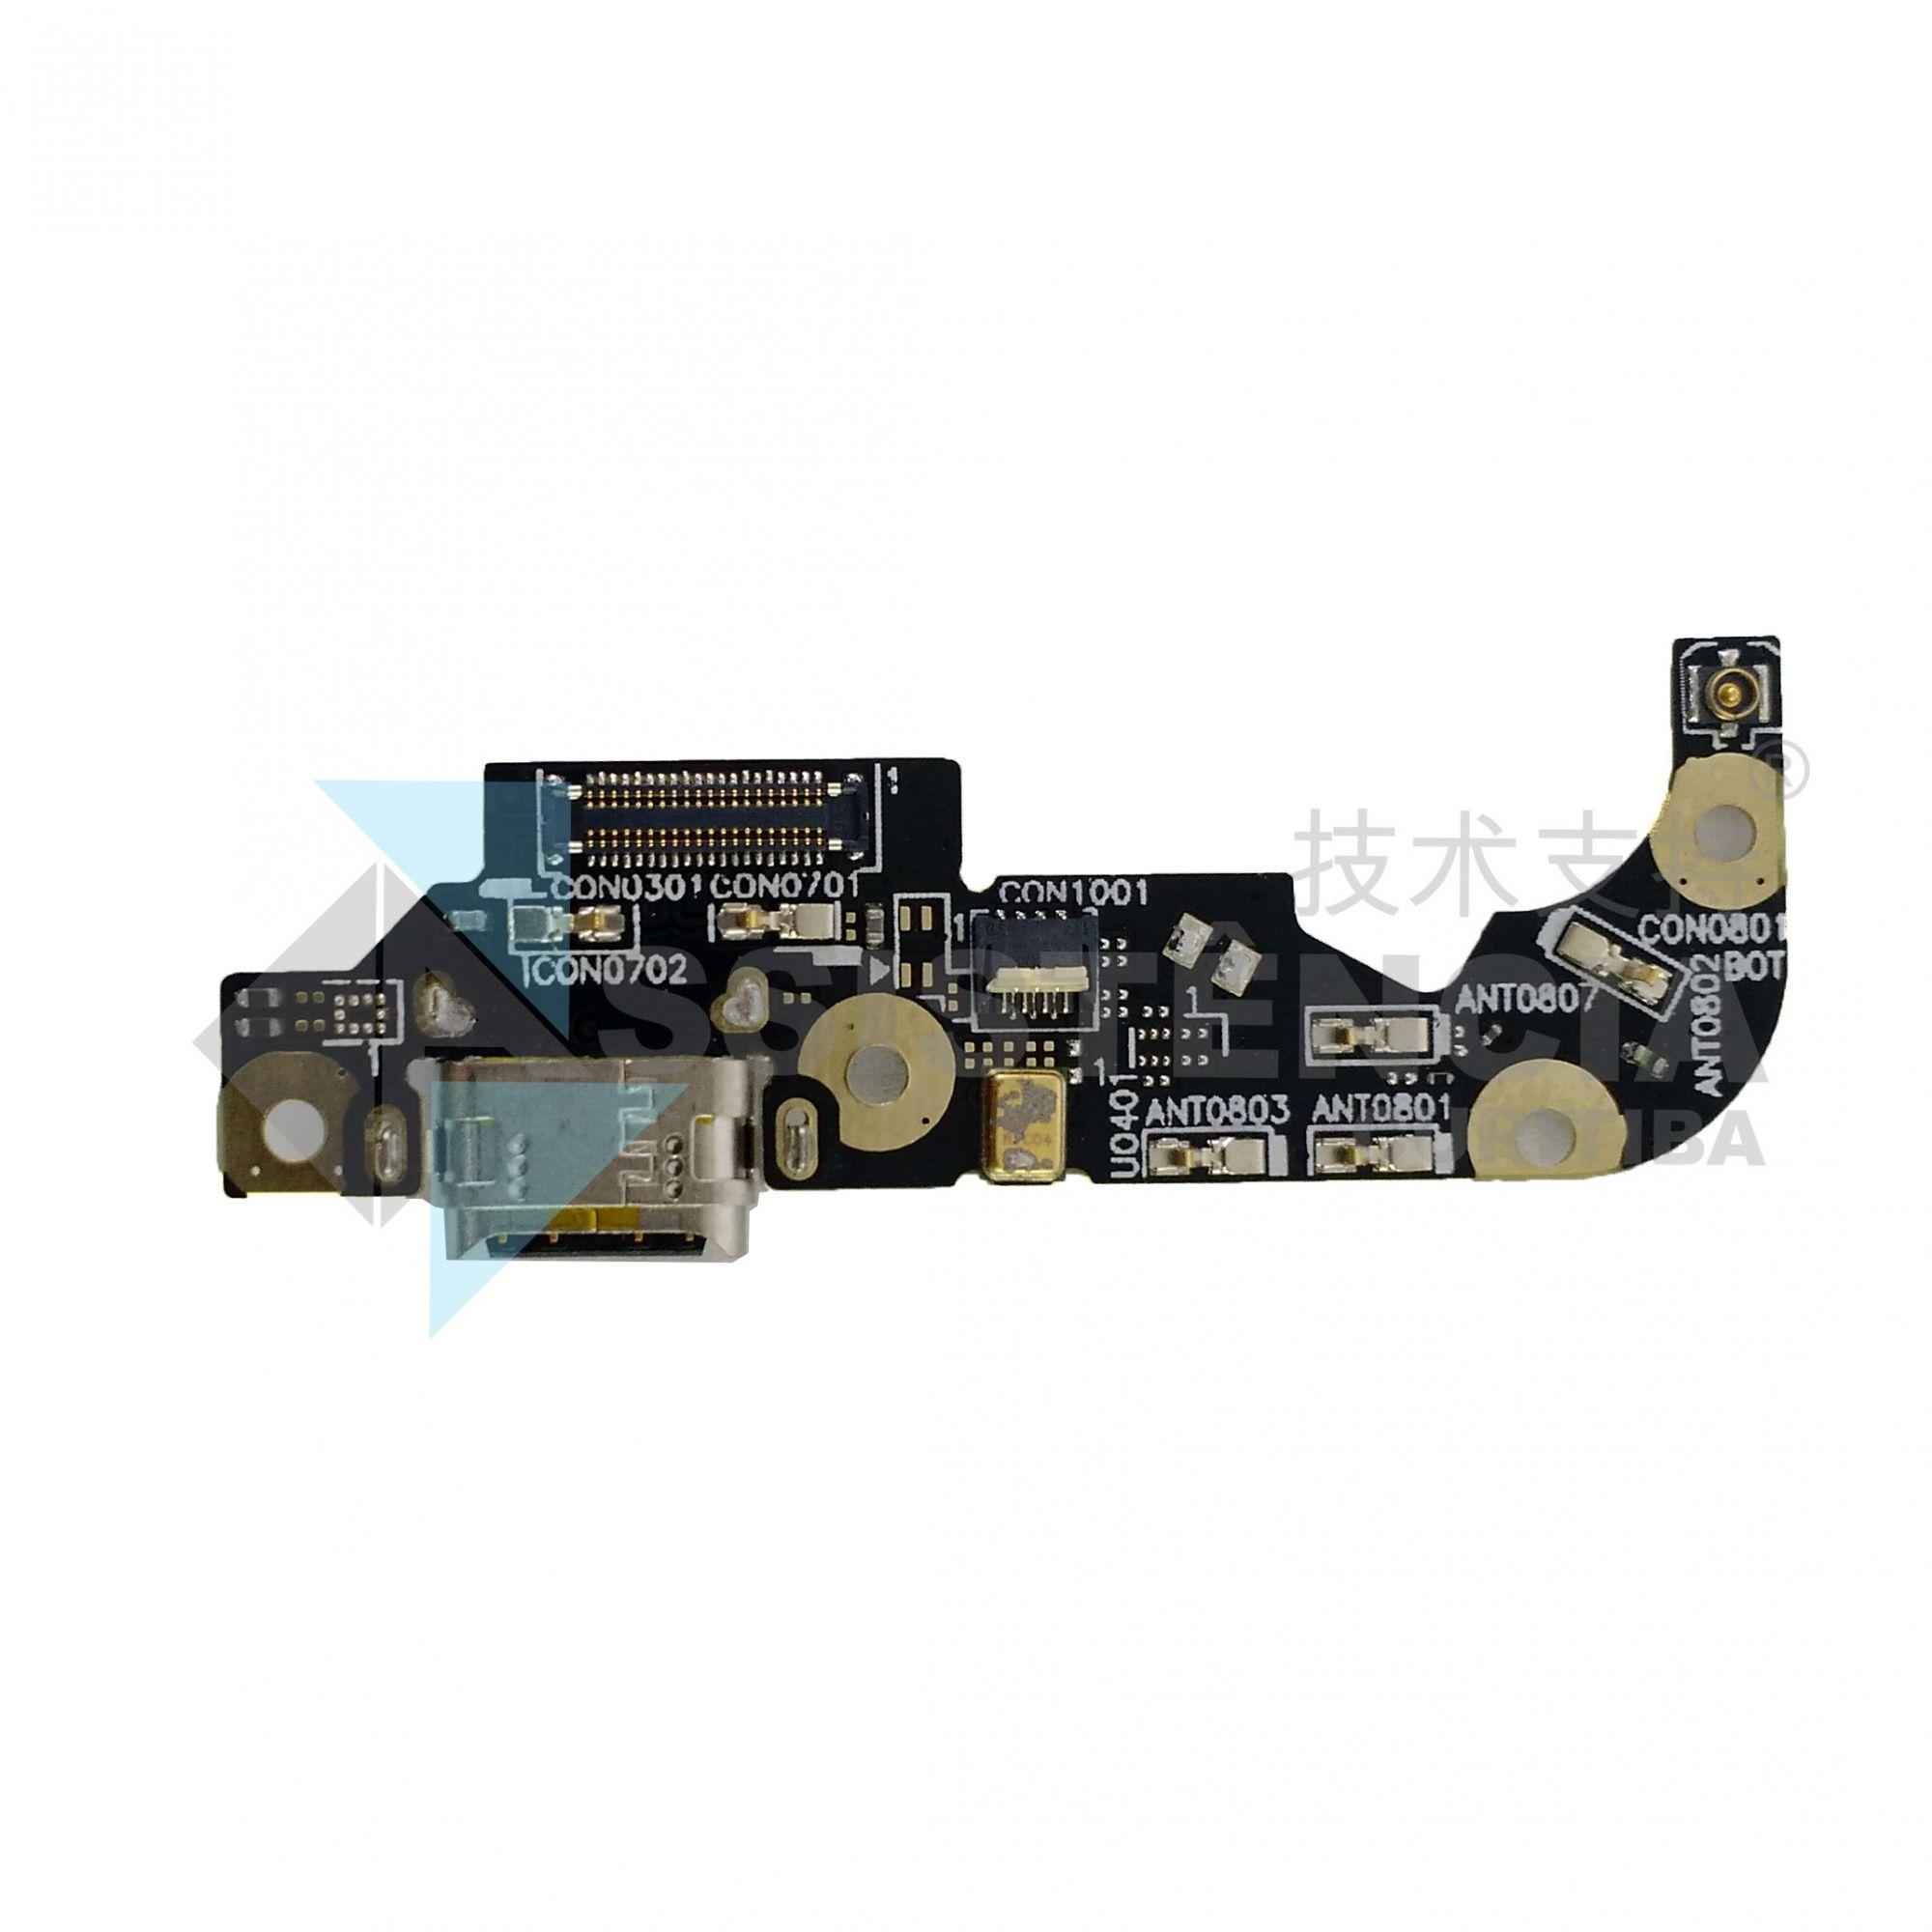 PLACA COM CONECTOR CARGA E MICROFONE ASUS ZENFONE 3 ZE552KL Z012D